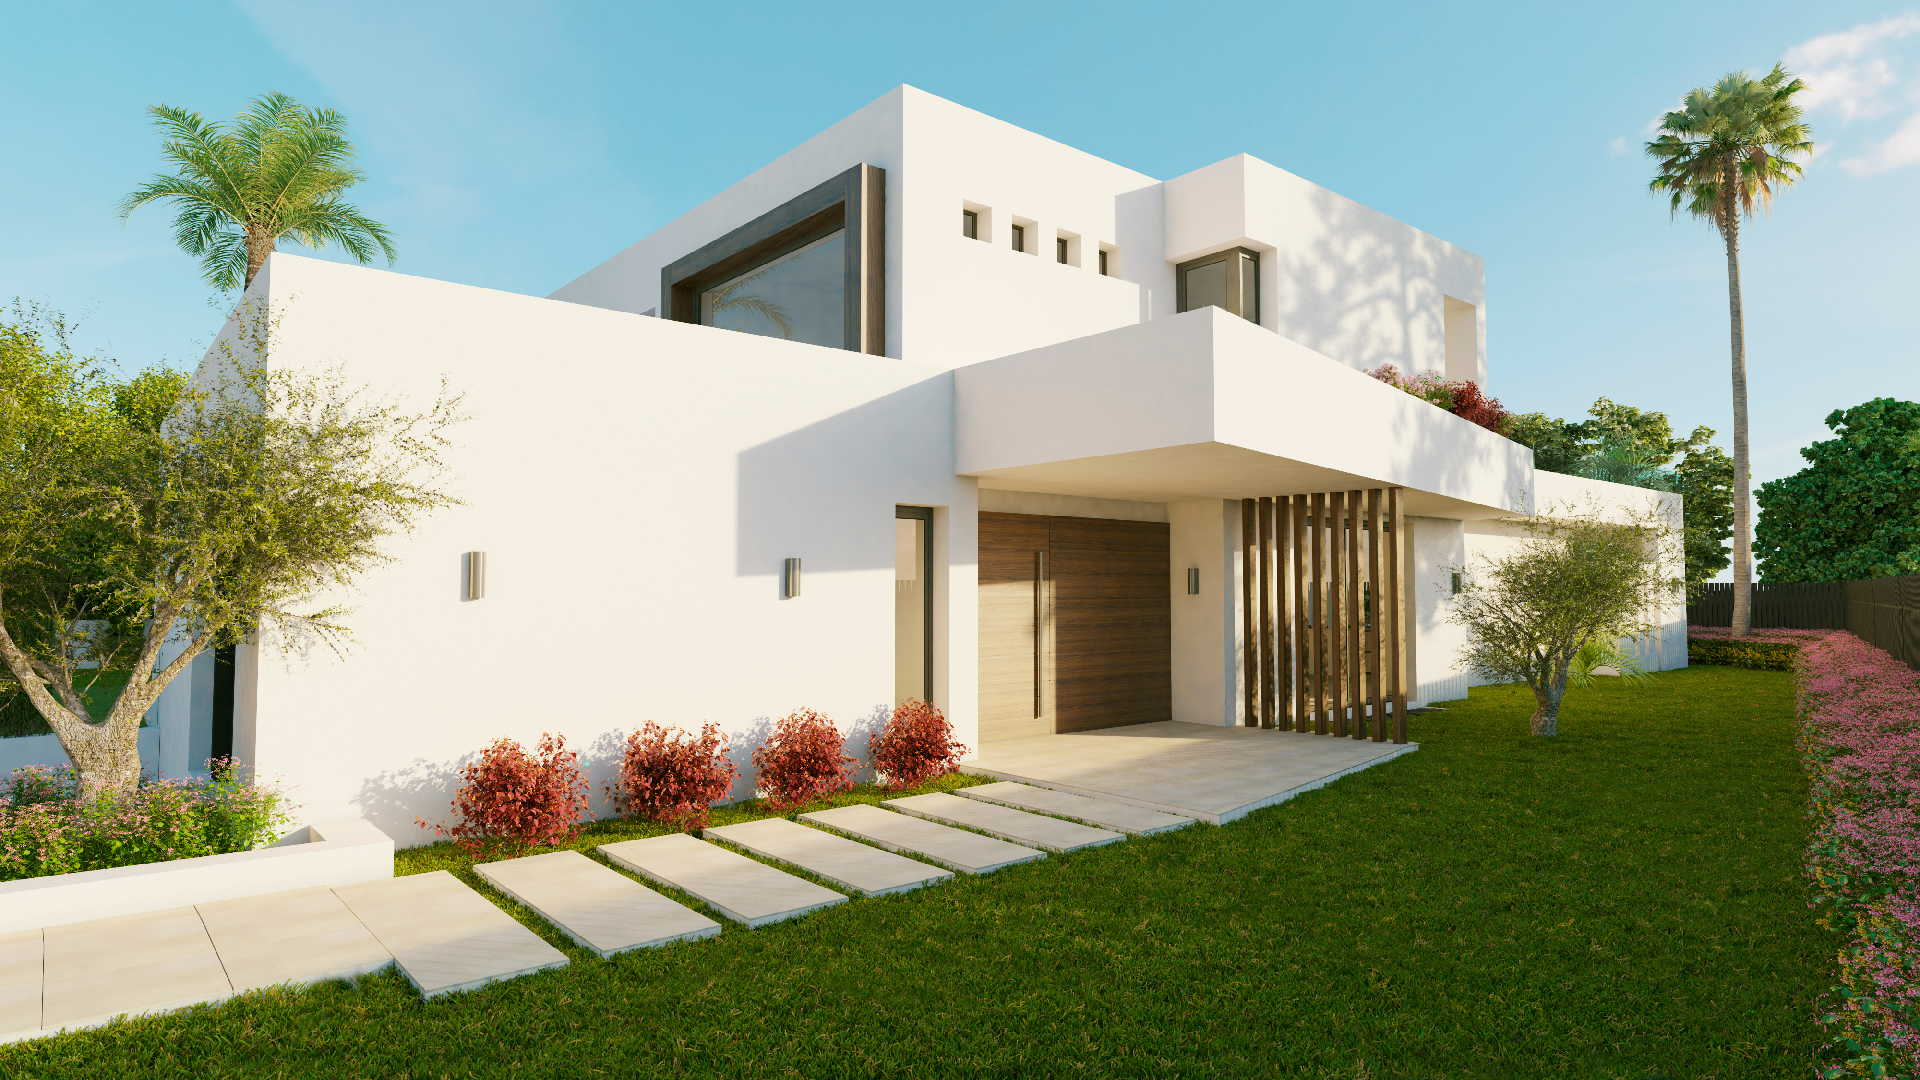 Los olivos nueva andalucia marbella new modern villa for Moderne villa